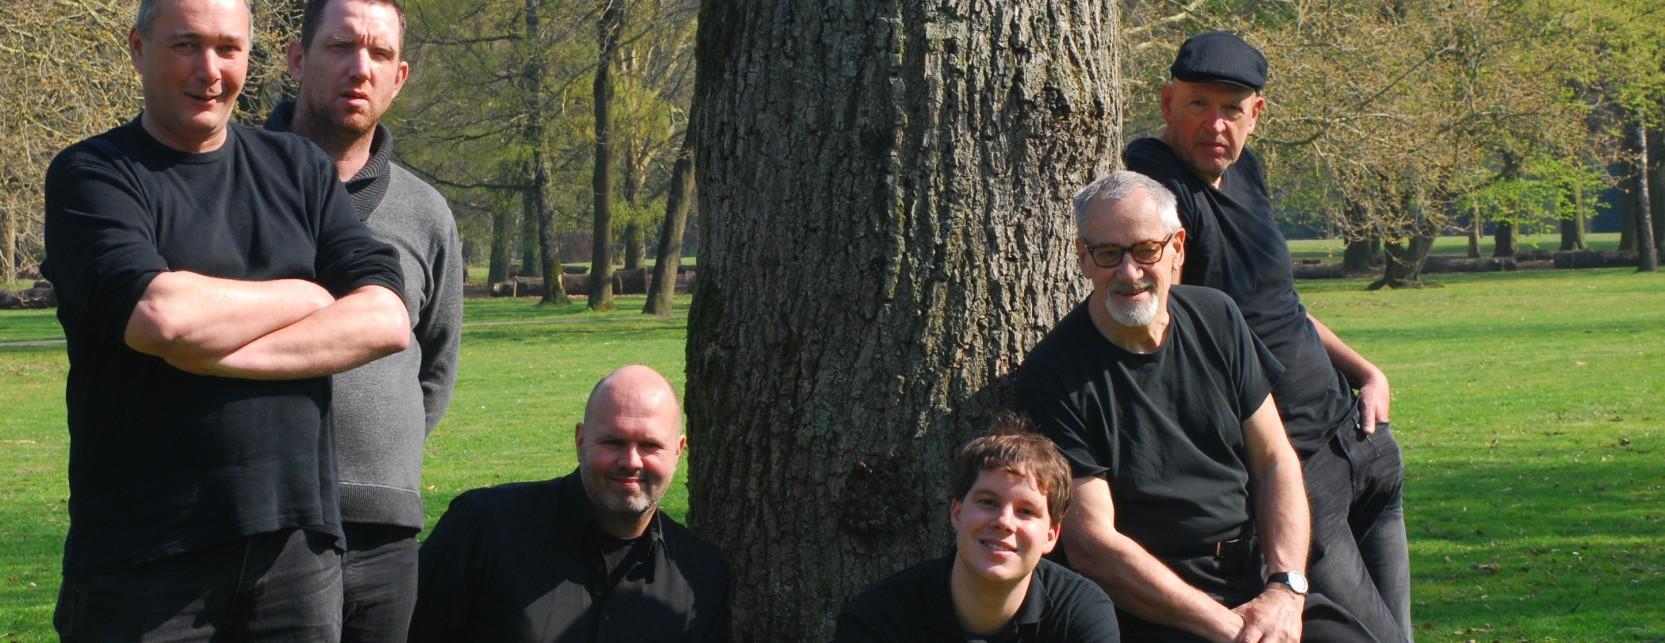 Theatergroep Hoofdzaak